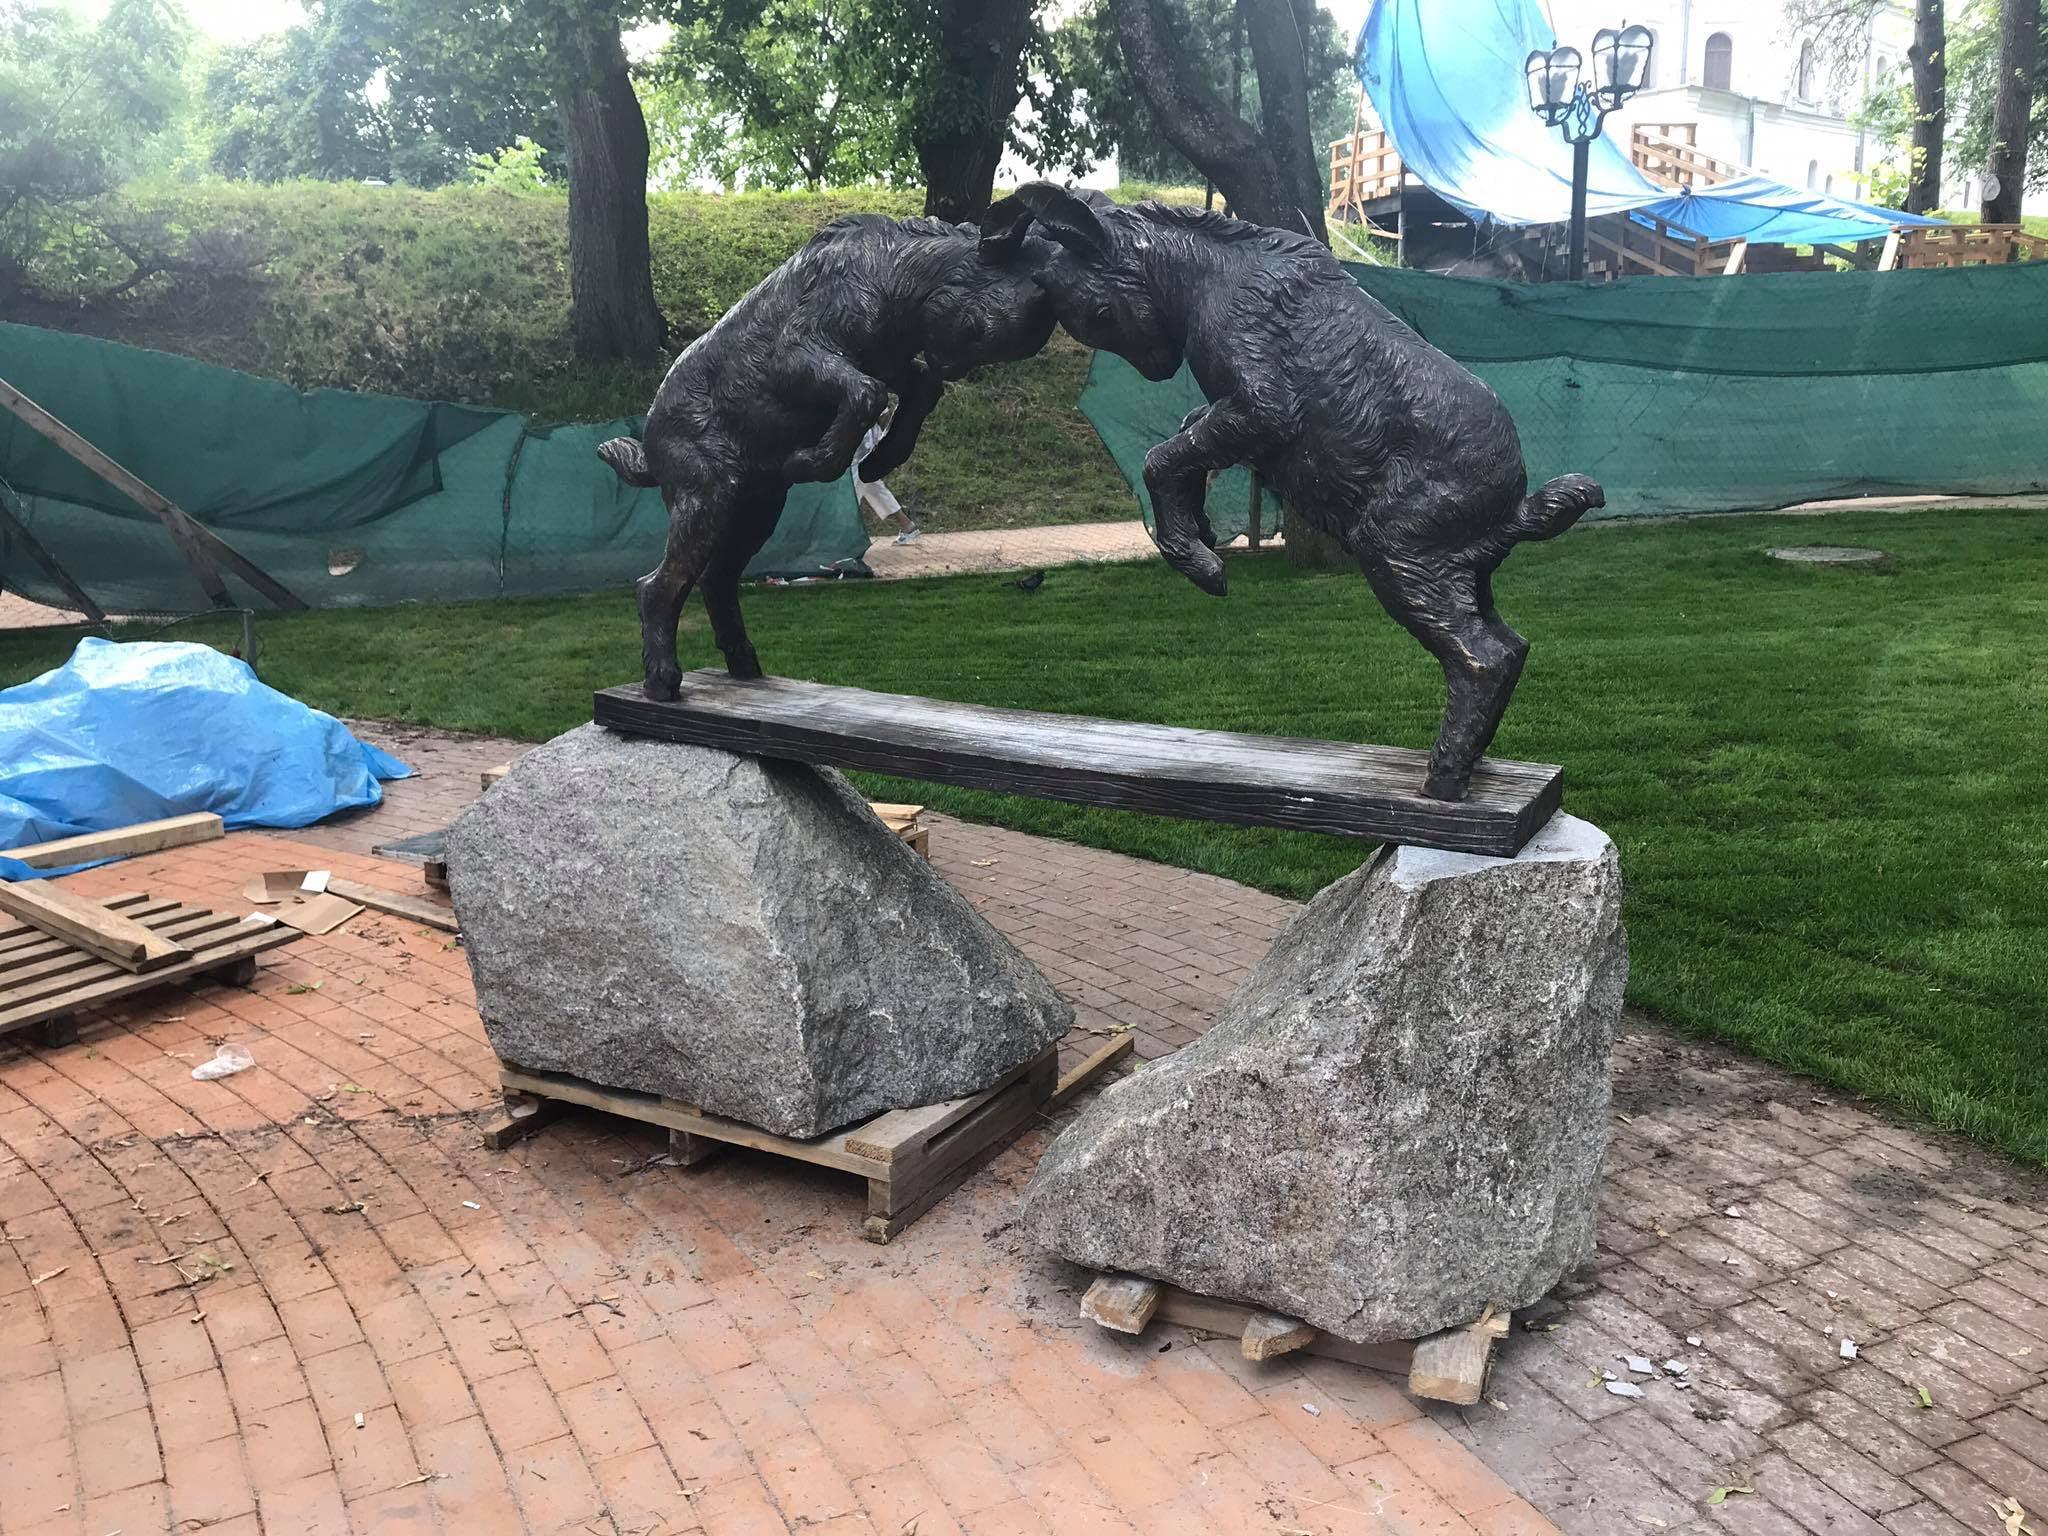 Скульптура з двома цапками для фонтану вже на Валу. ФОТОфакт